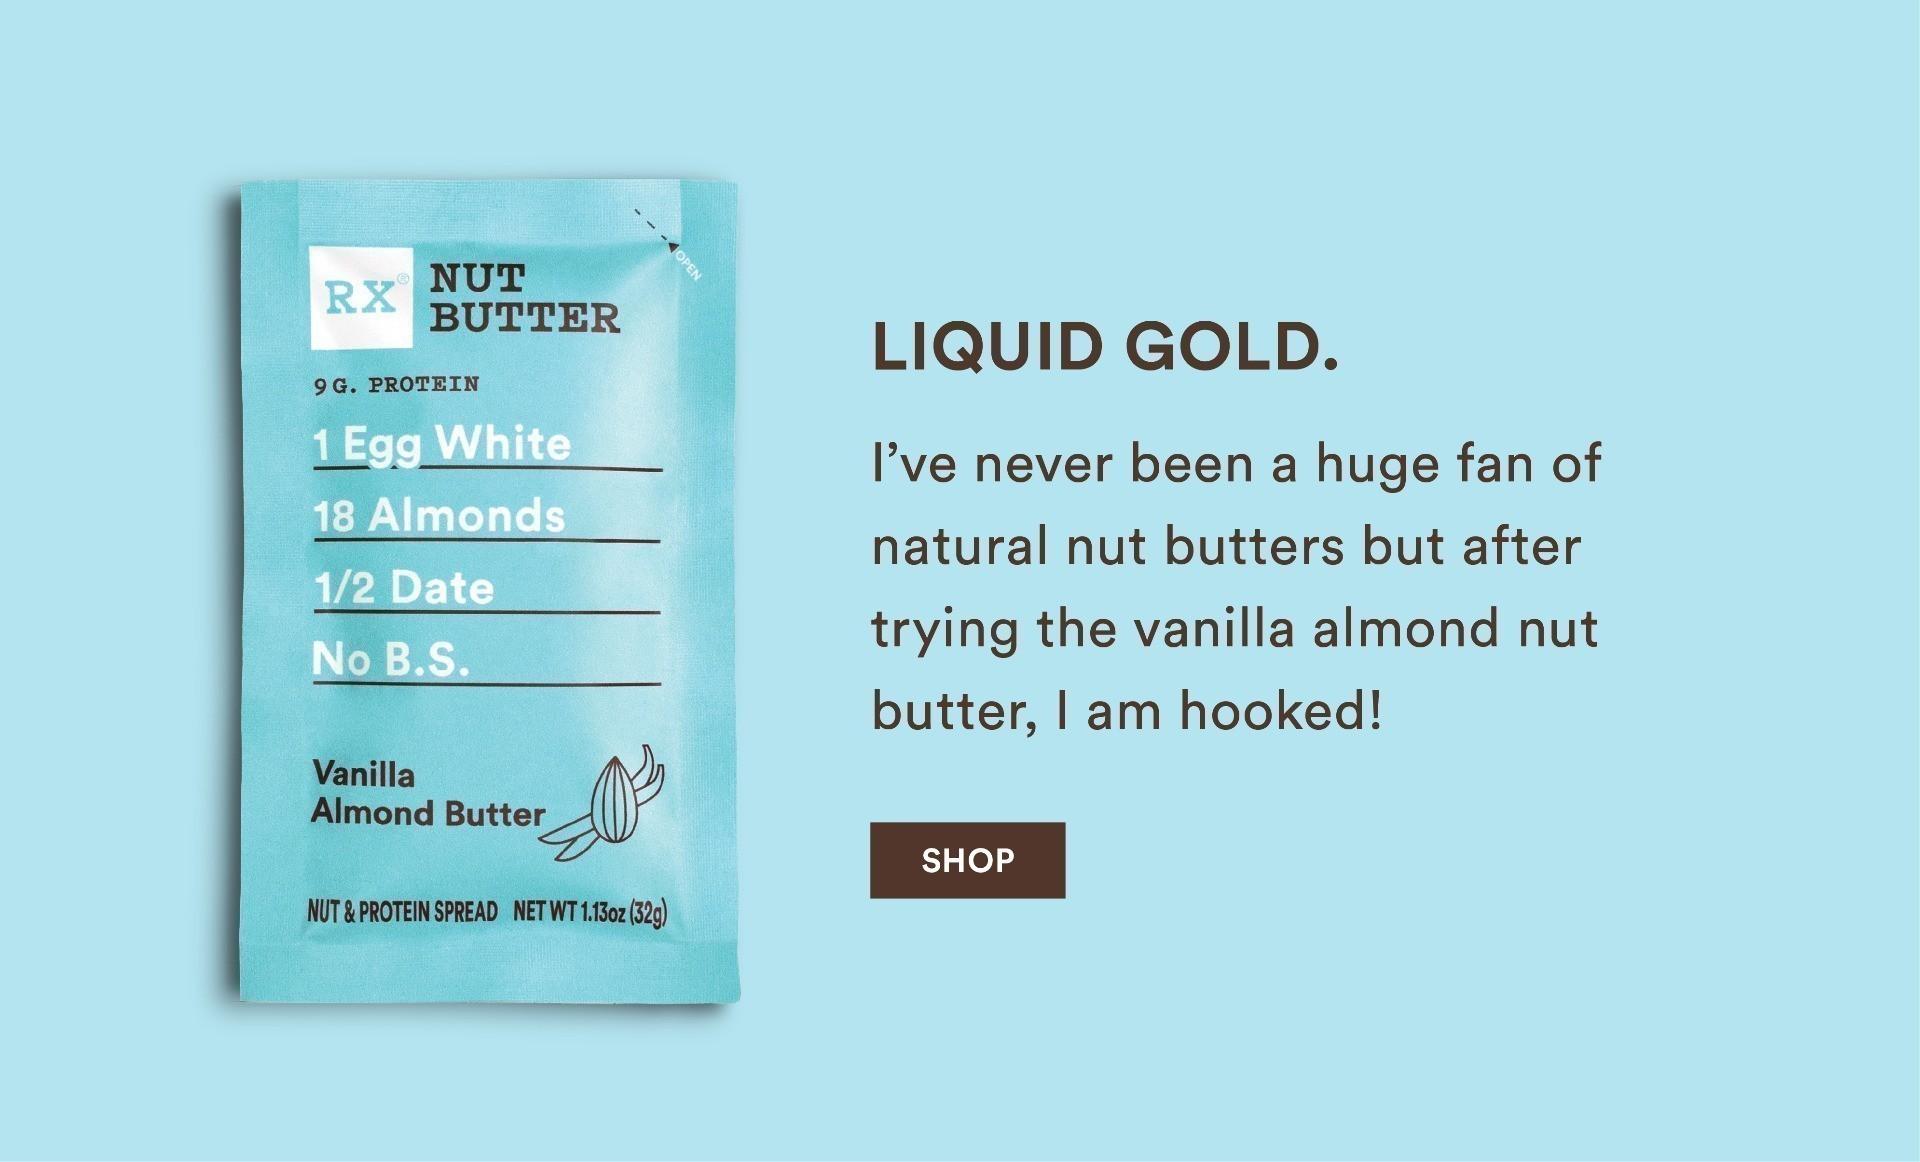 Vanilla Almond Butter is the best